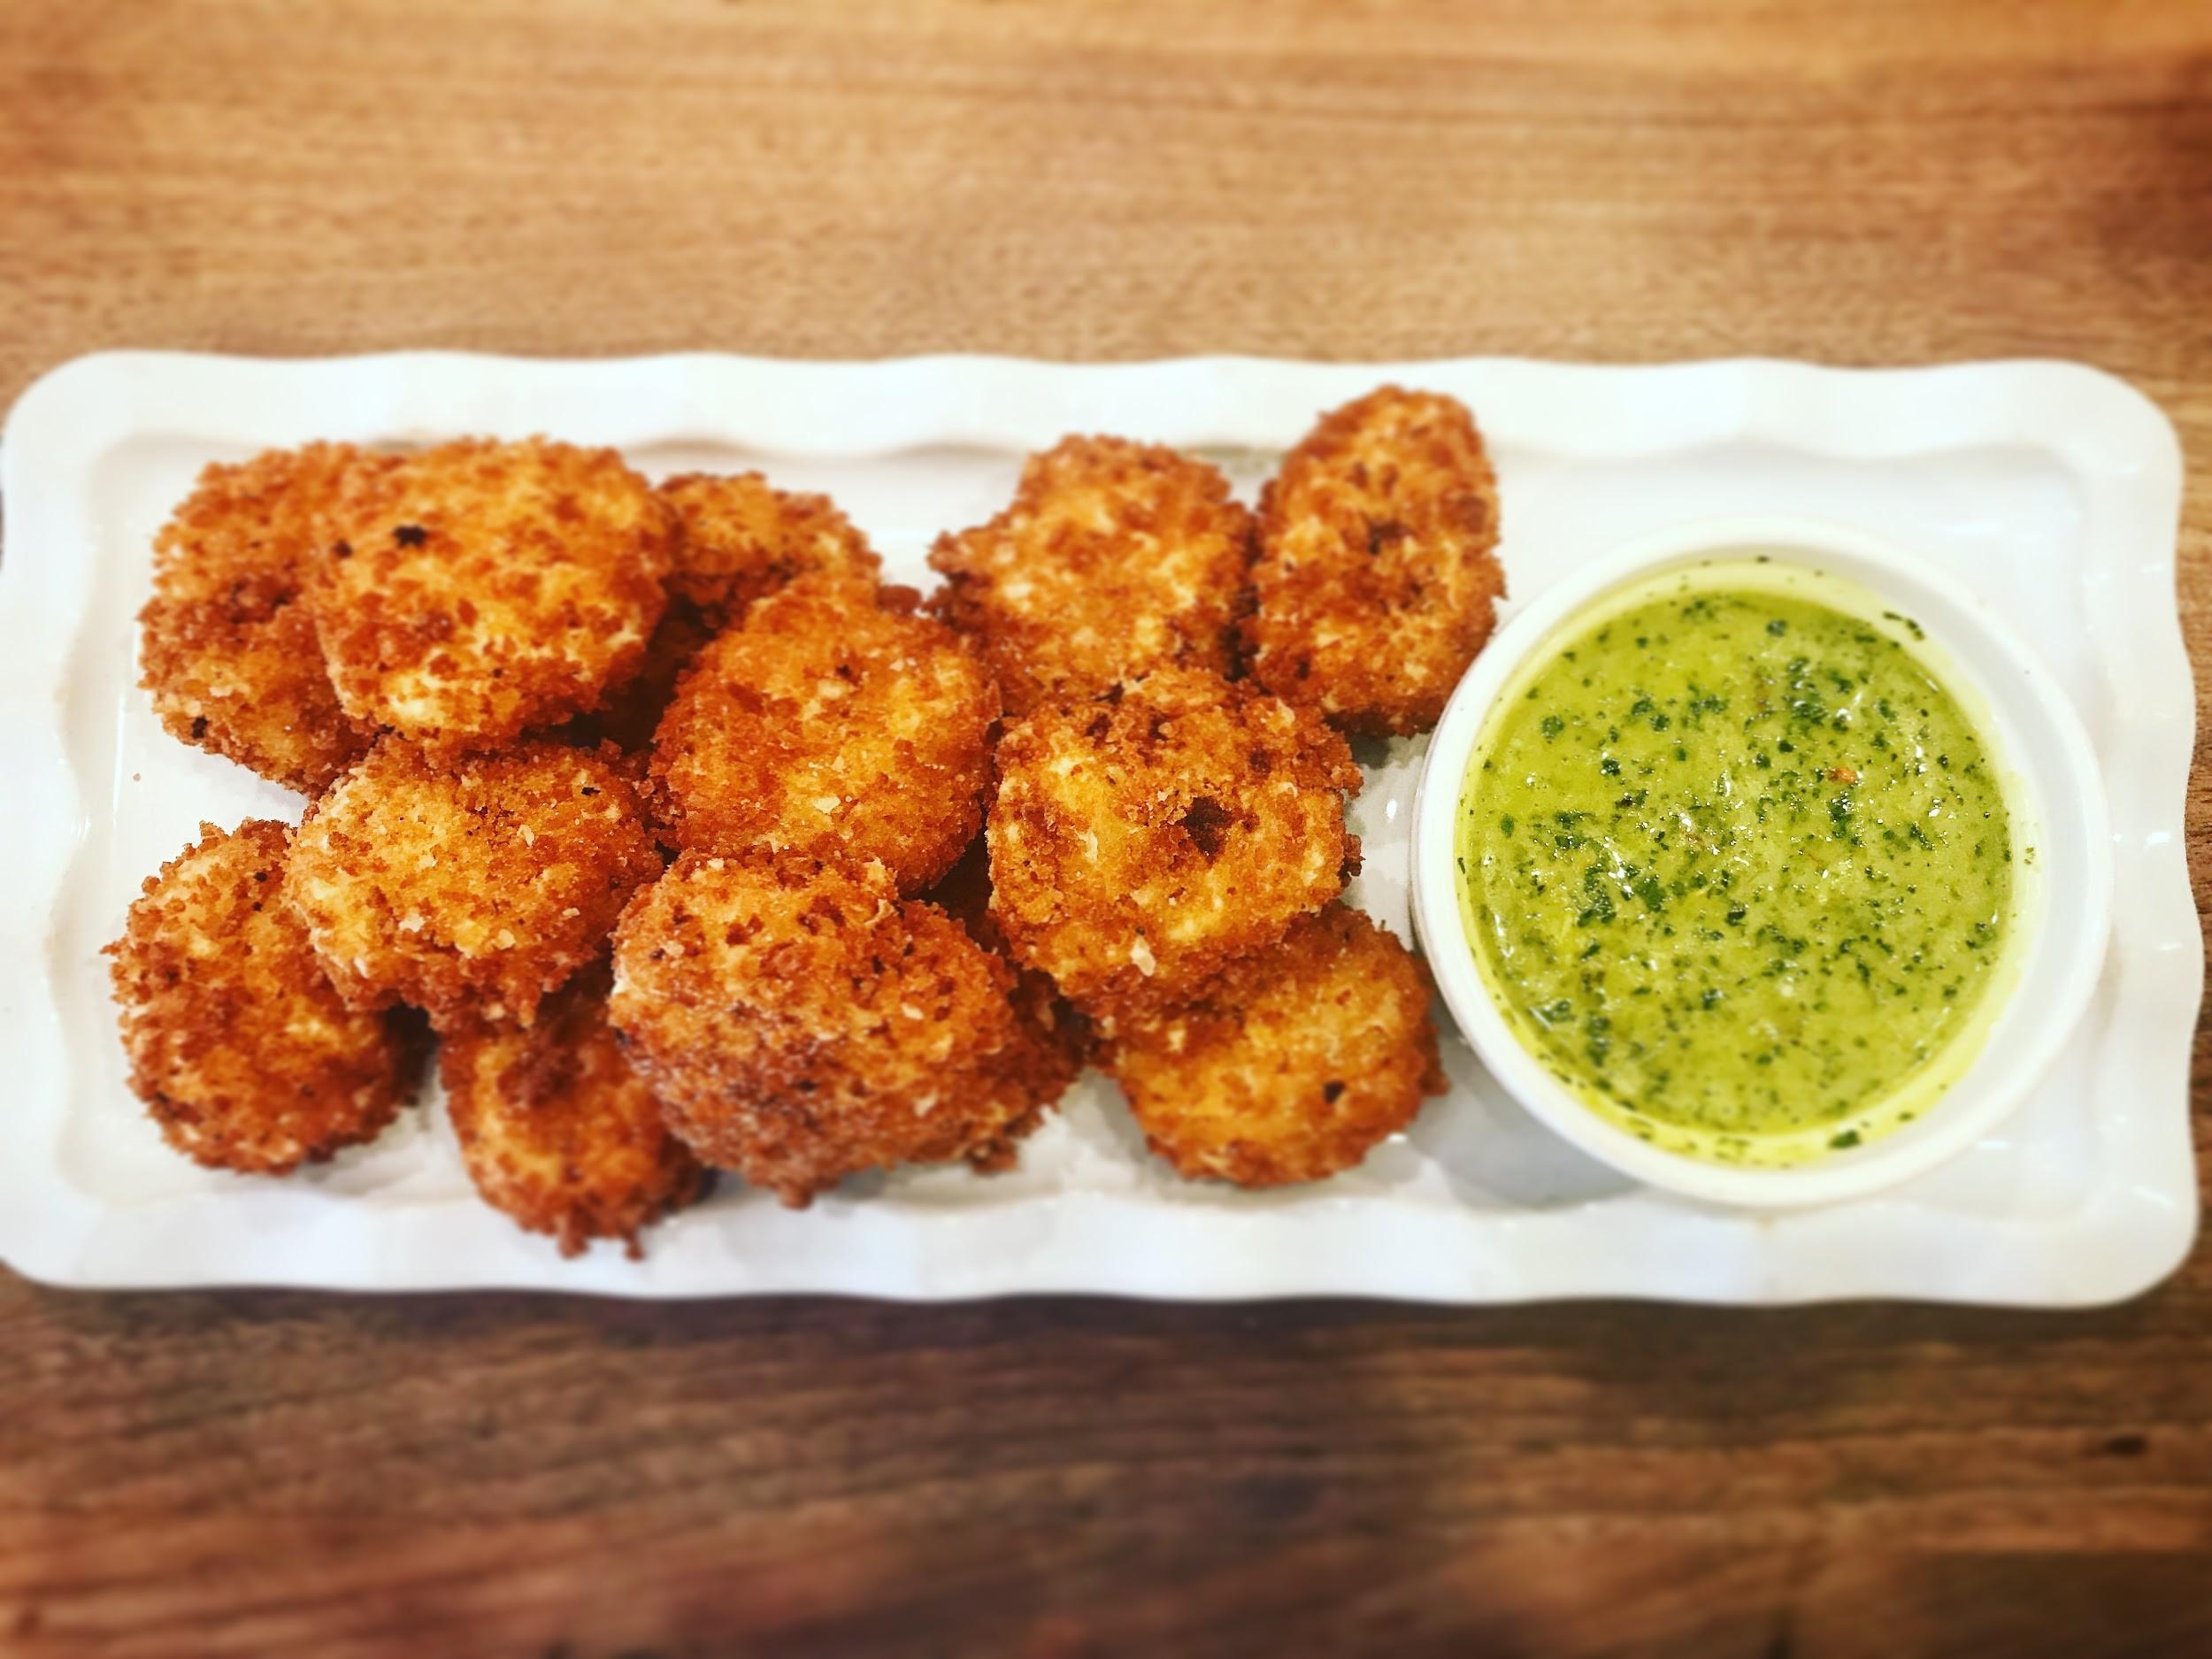 croquettas with chimichurri sauce sauce